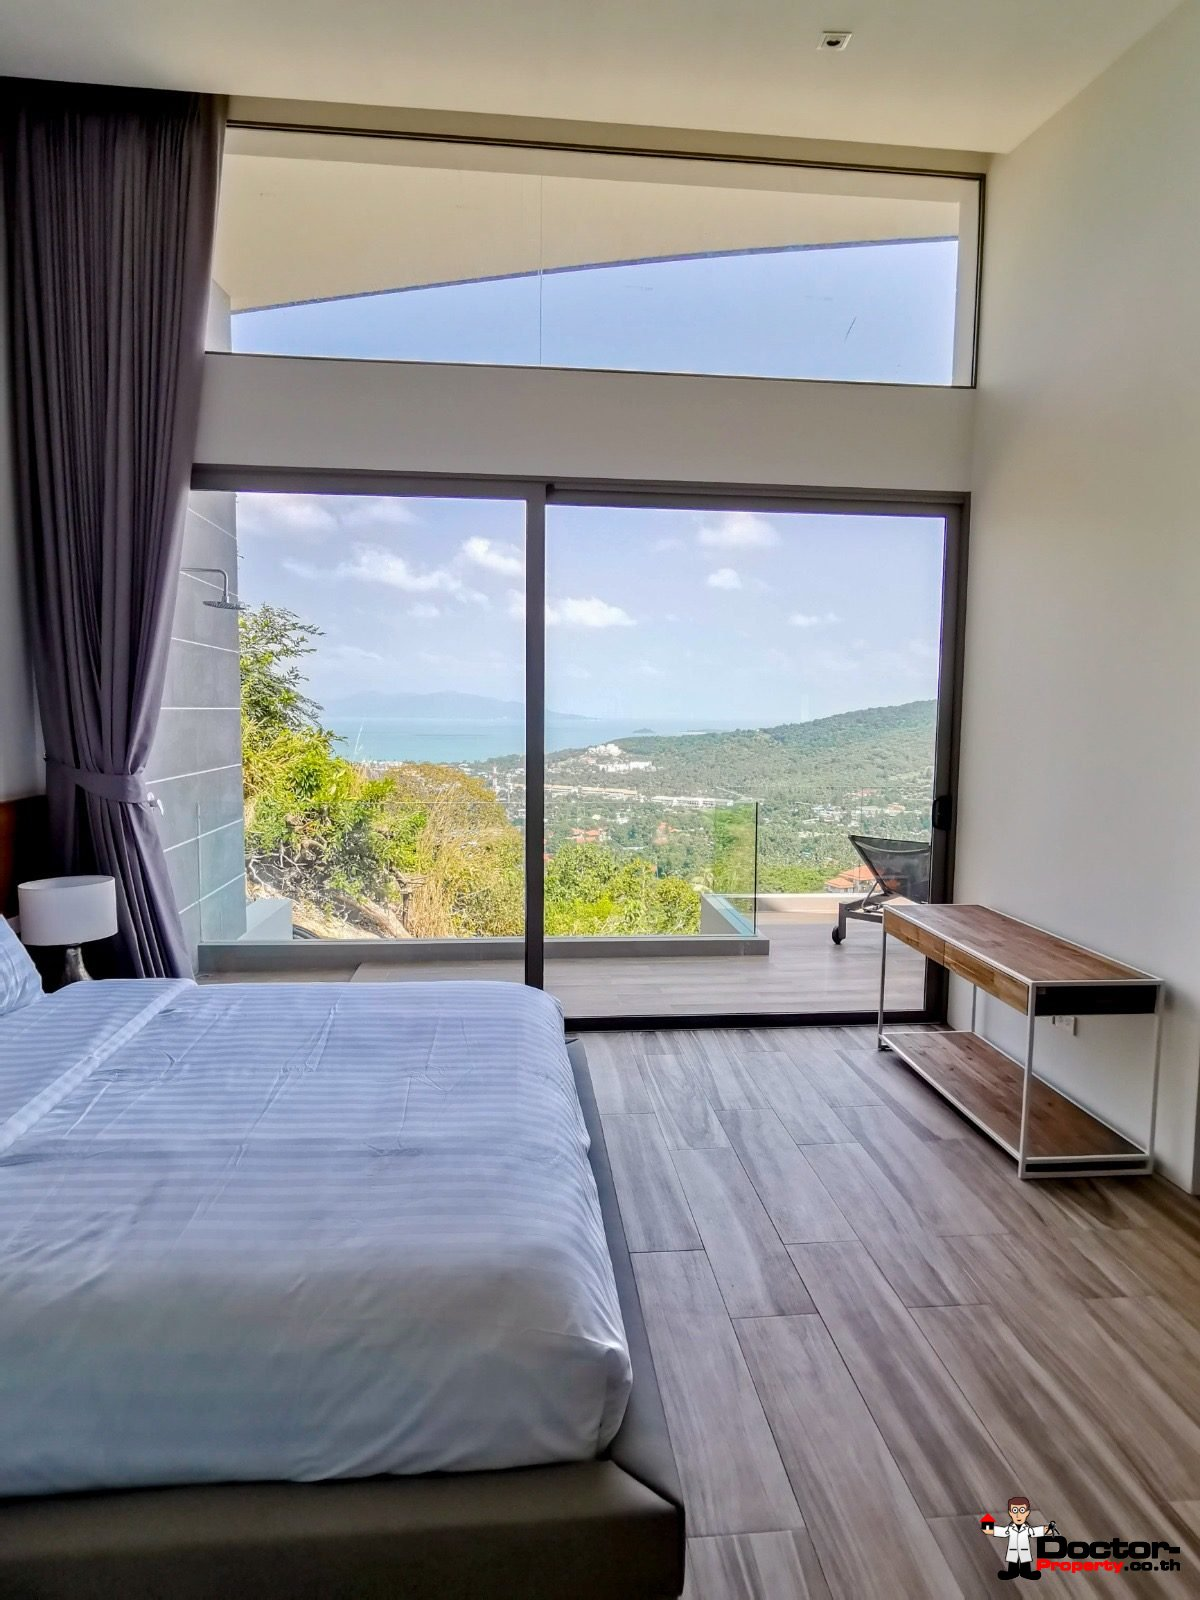 New 3 Bedroom Villa with Sea View in BoPhut - Koh Samui - For Sale